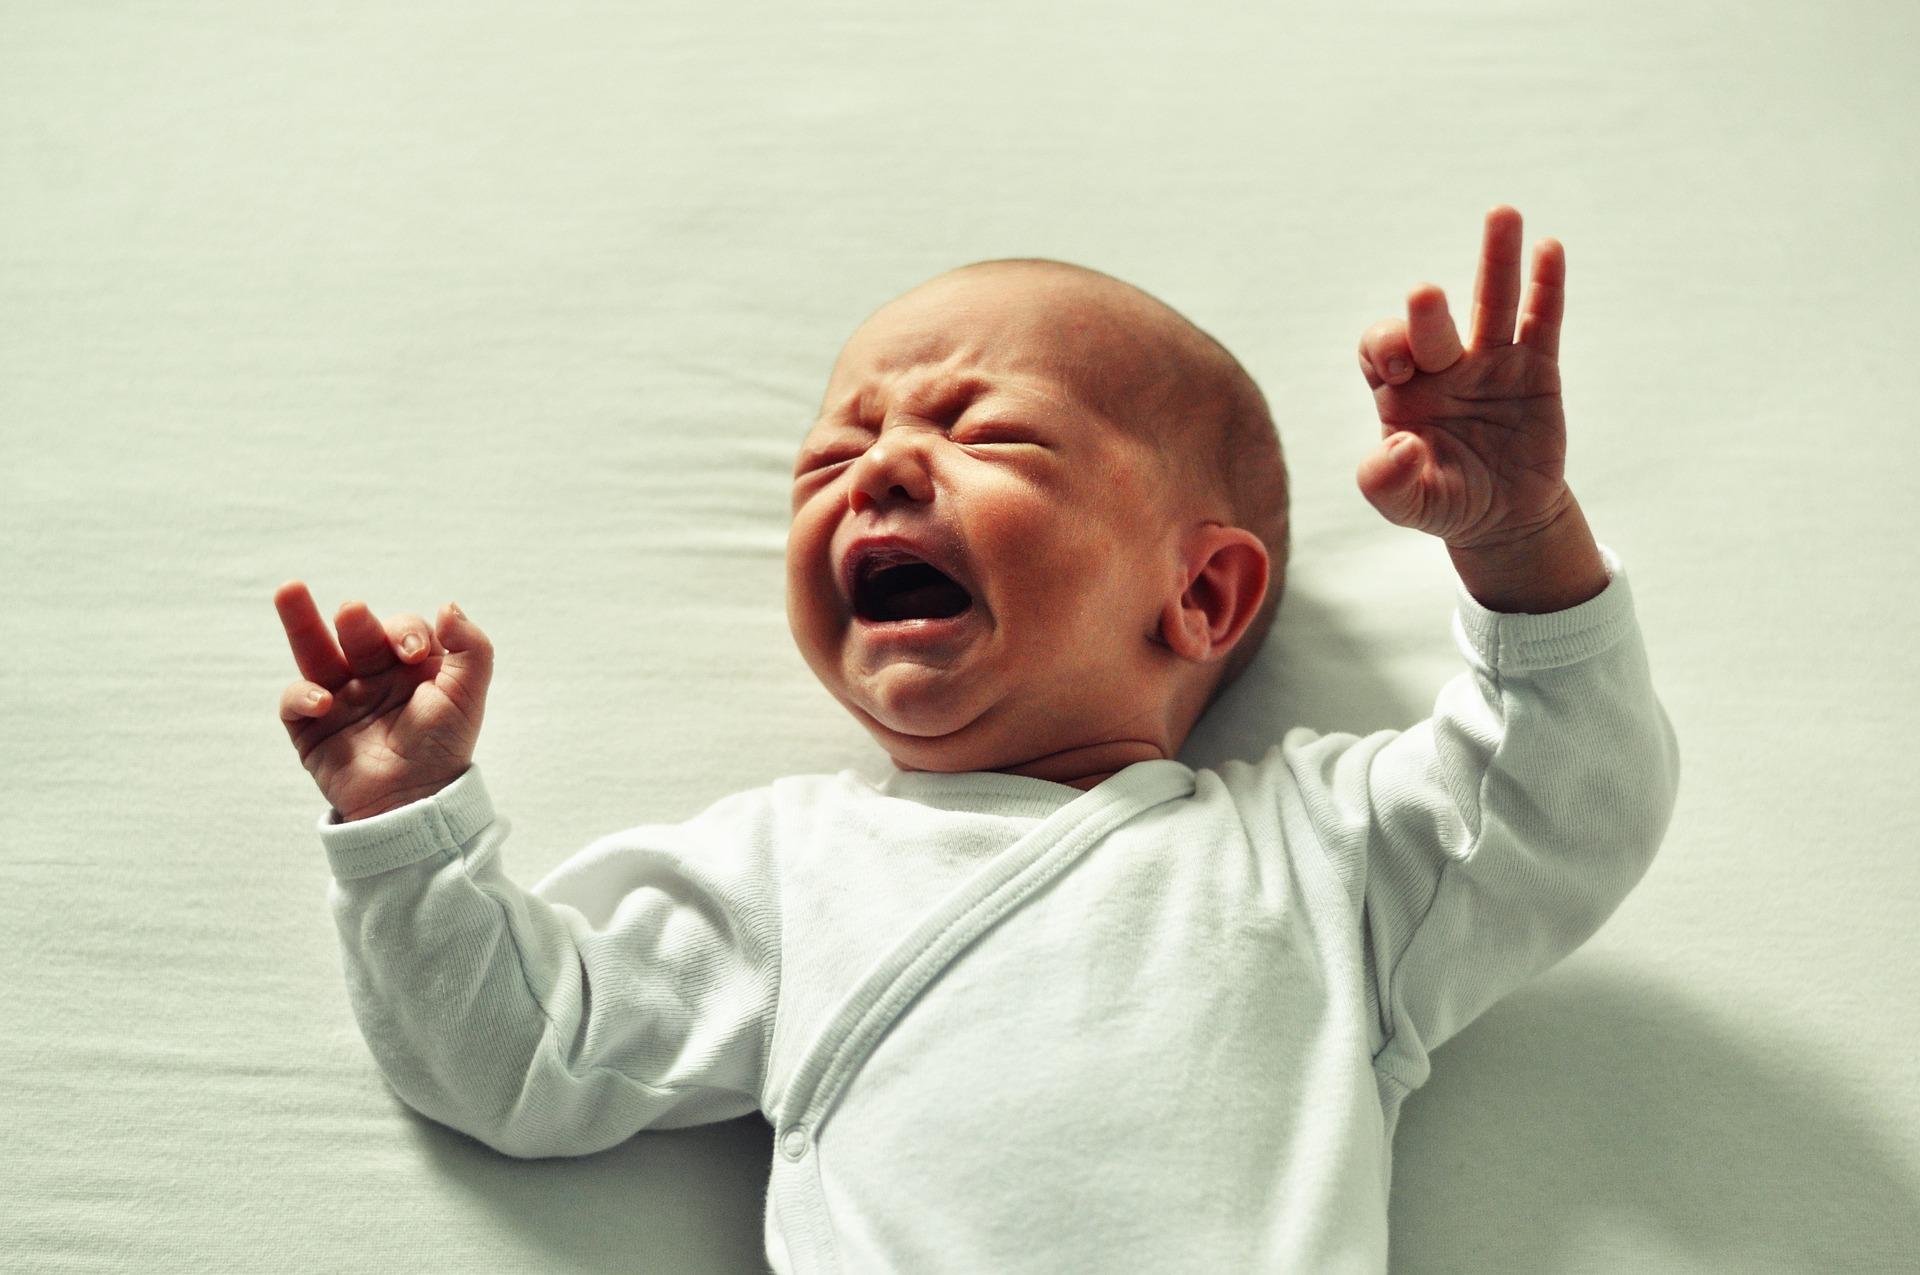 de ce plang bebelusii (1)